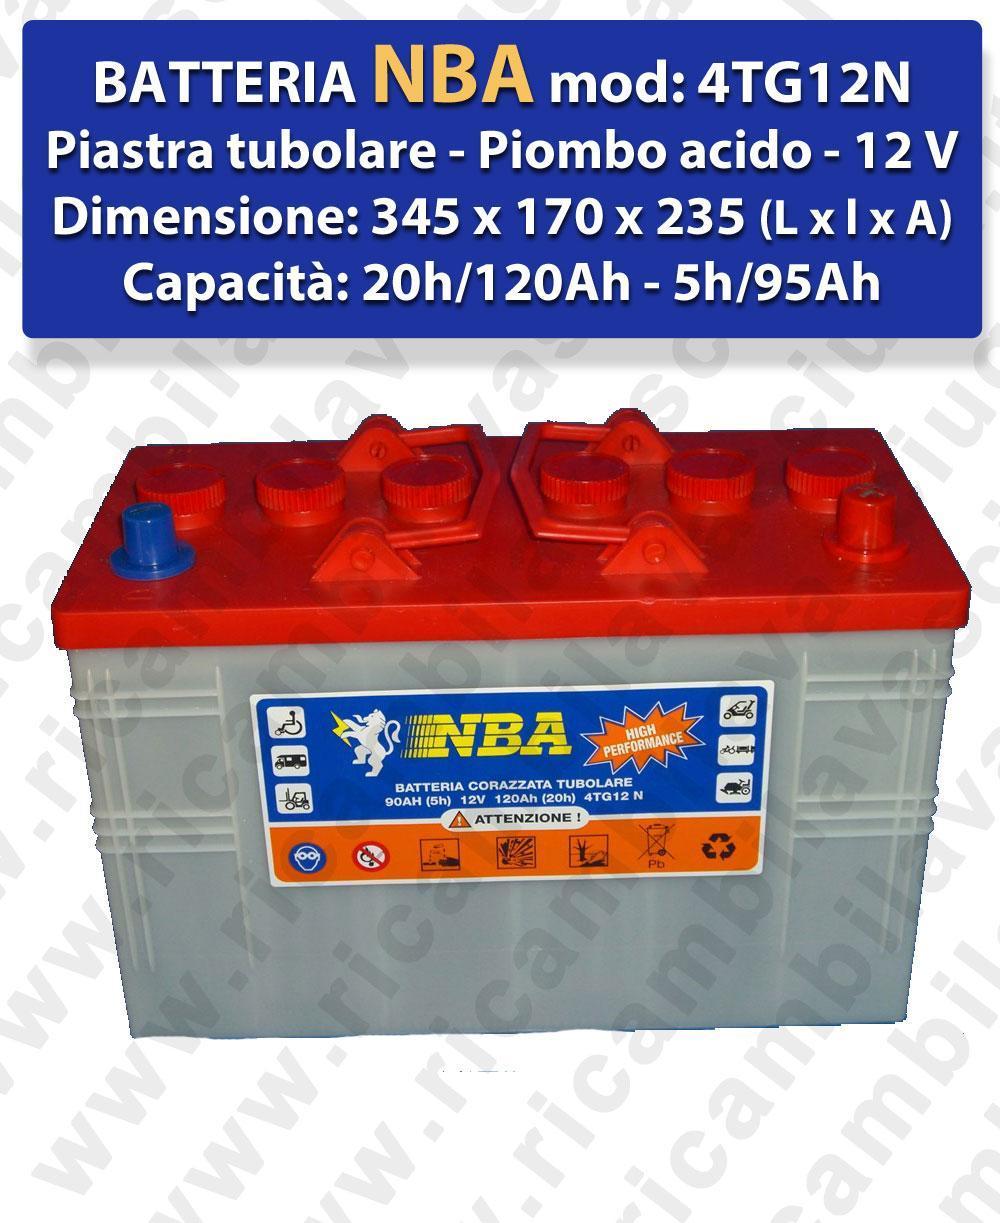 4TG12N Battery piombo - NBA 12V 120Ah 20/h